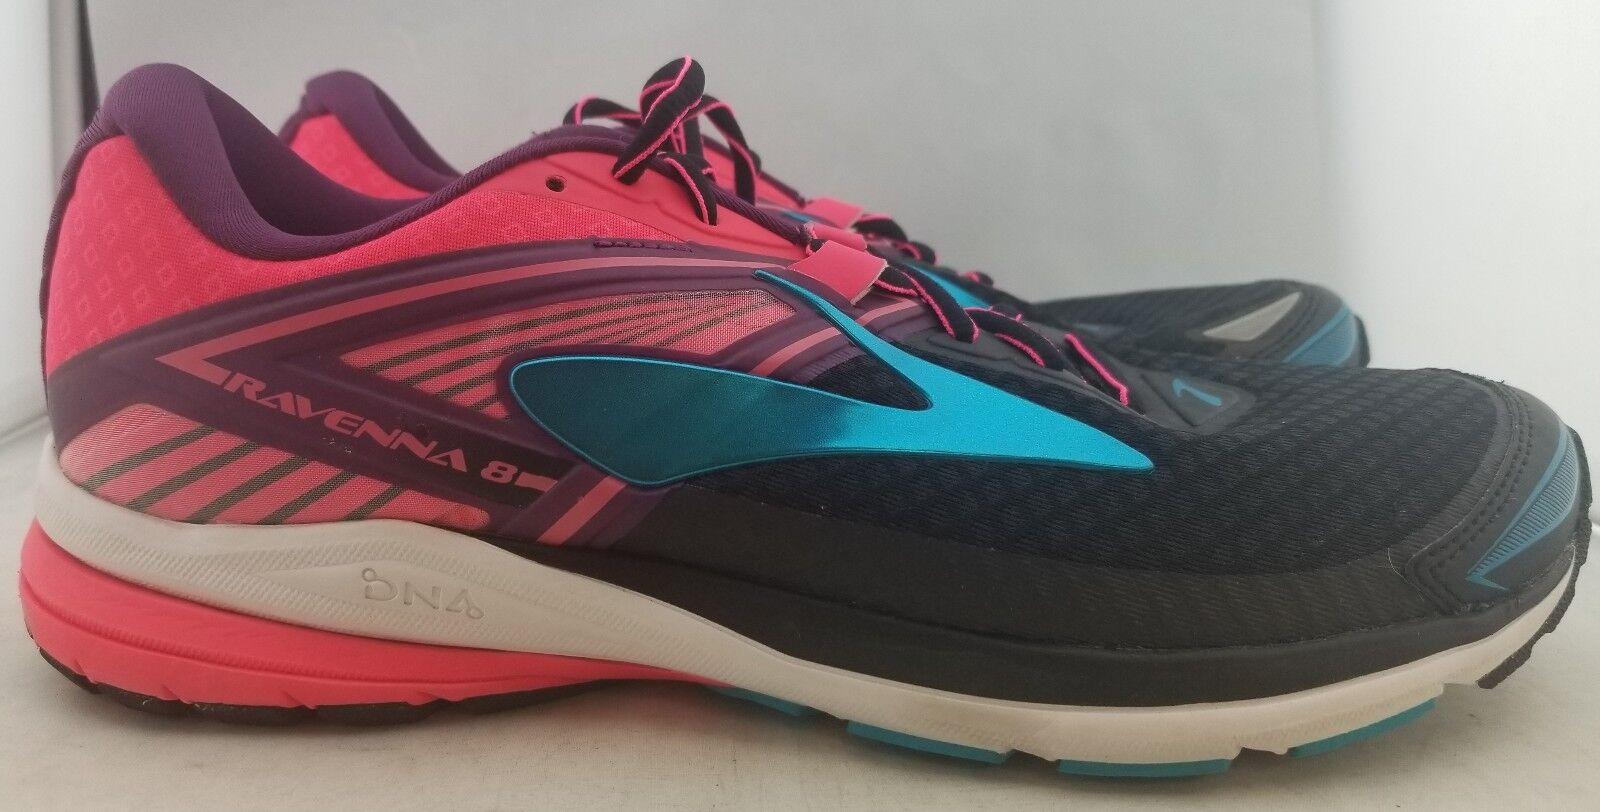 Brooks Ravenna 8 Running Shoe  noir /rose/bleu femmes  US 11 Eur 43 (R2,24)